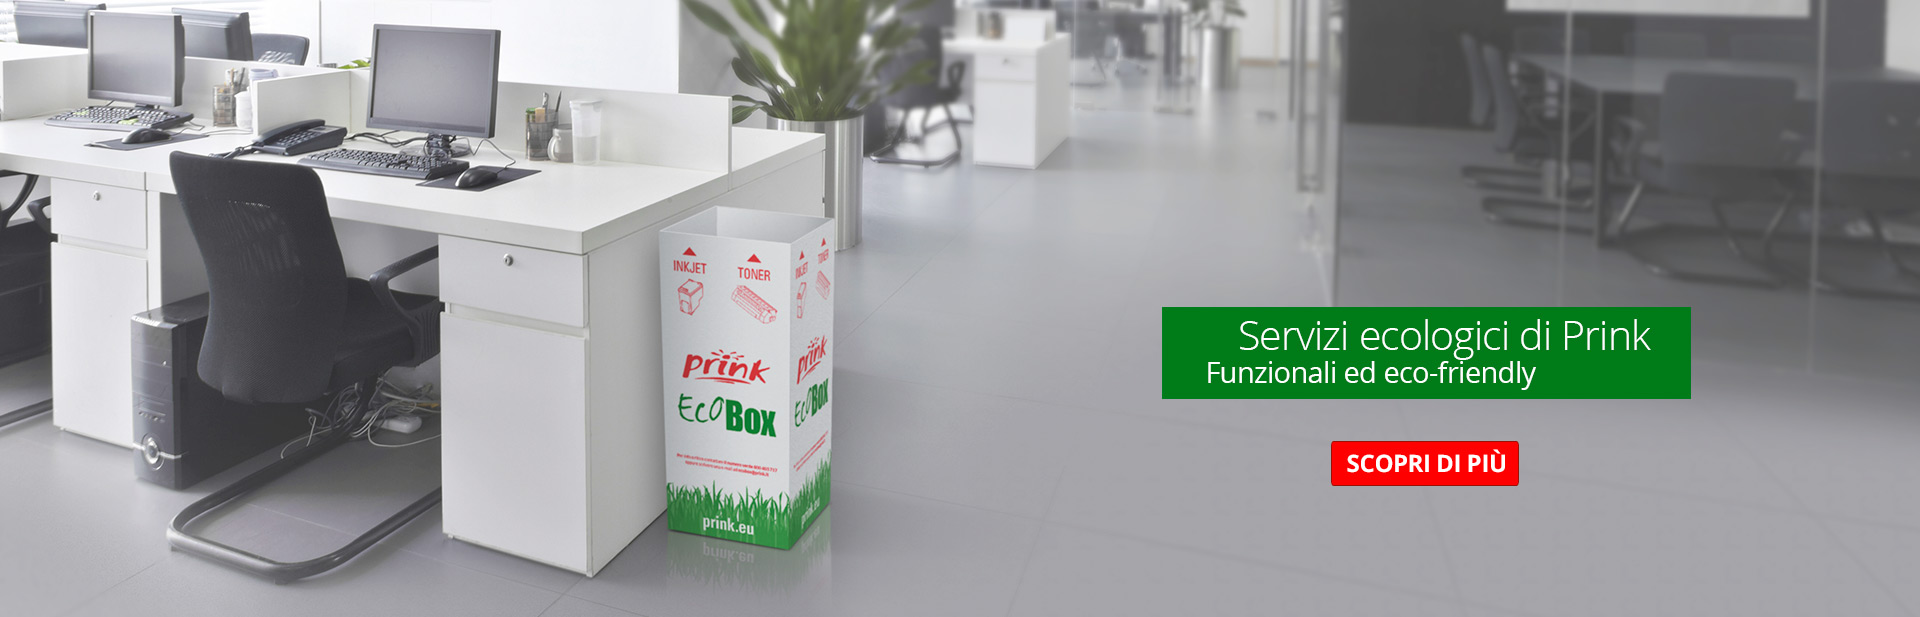 servizi-ecologici-nei-negozi-Prink-SLIDE